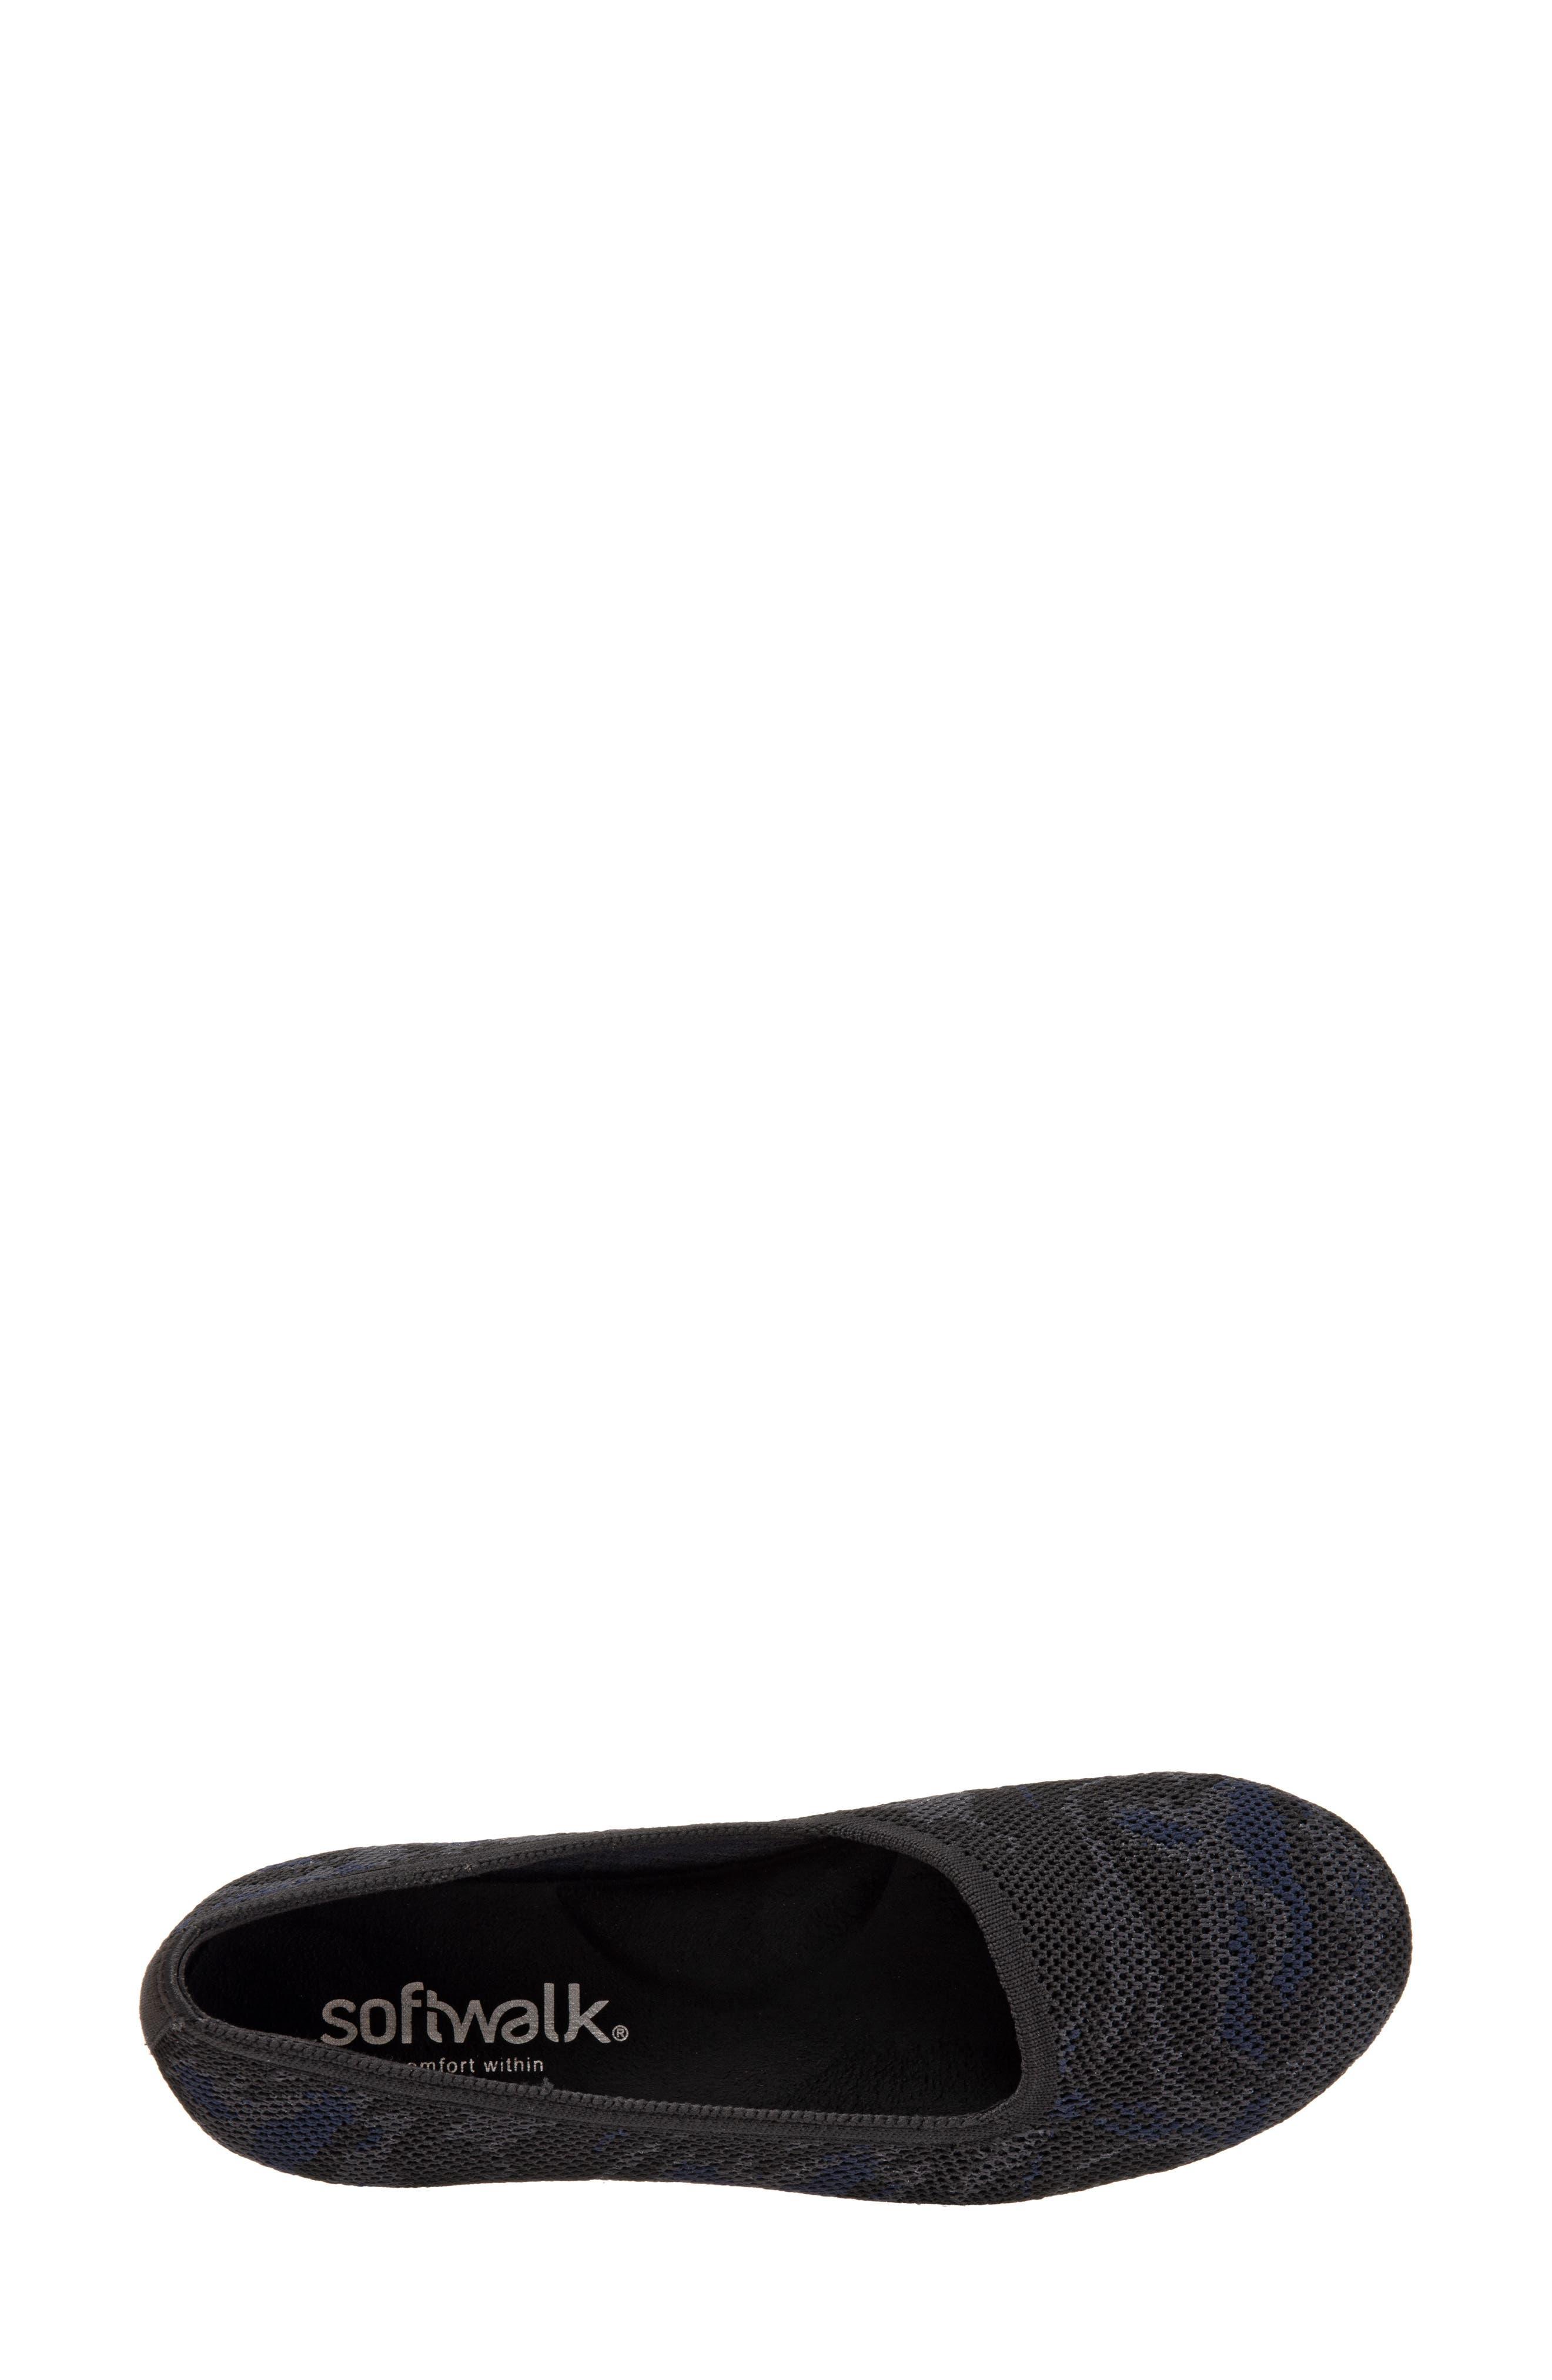 SOFTWALK<SUP>®</SUP>, Sicily Knit Flat, Alternate thumbnail 5, color, BLACK/ GREY FABRIC